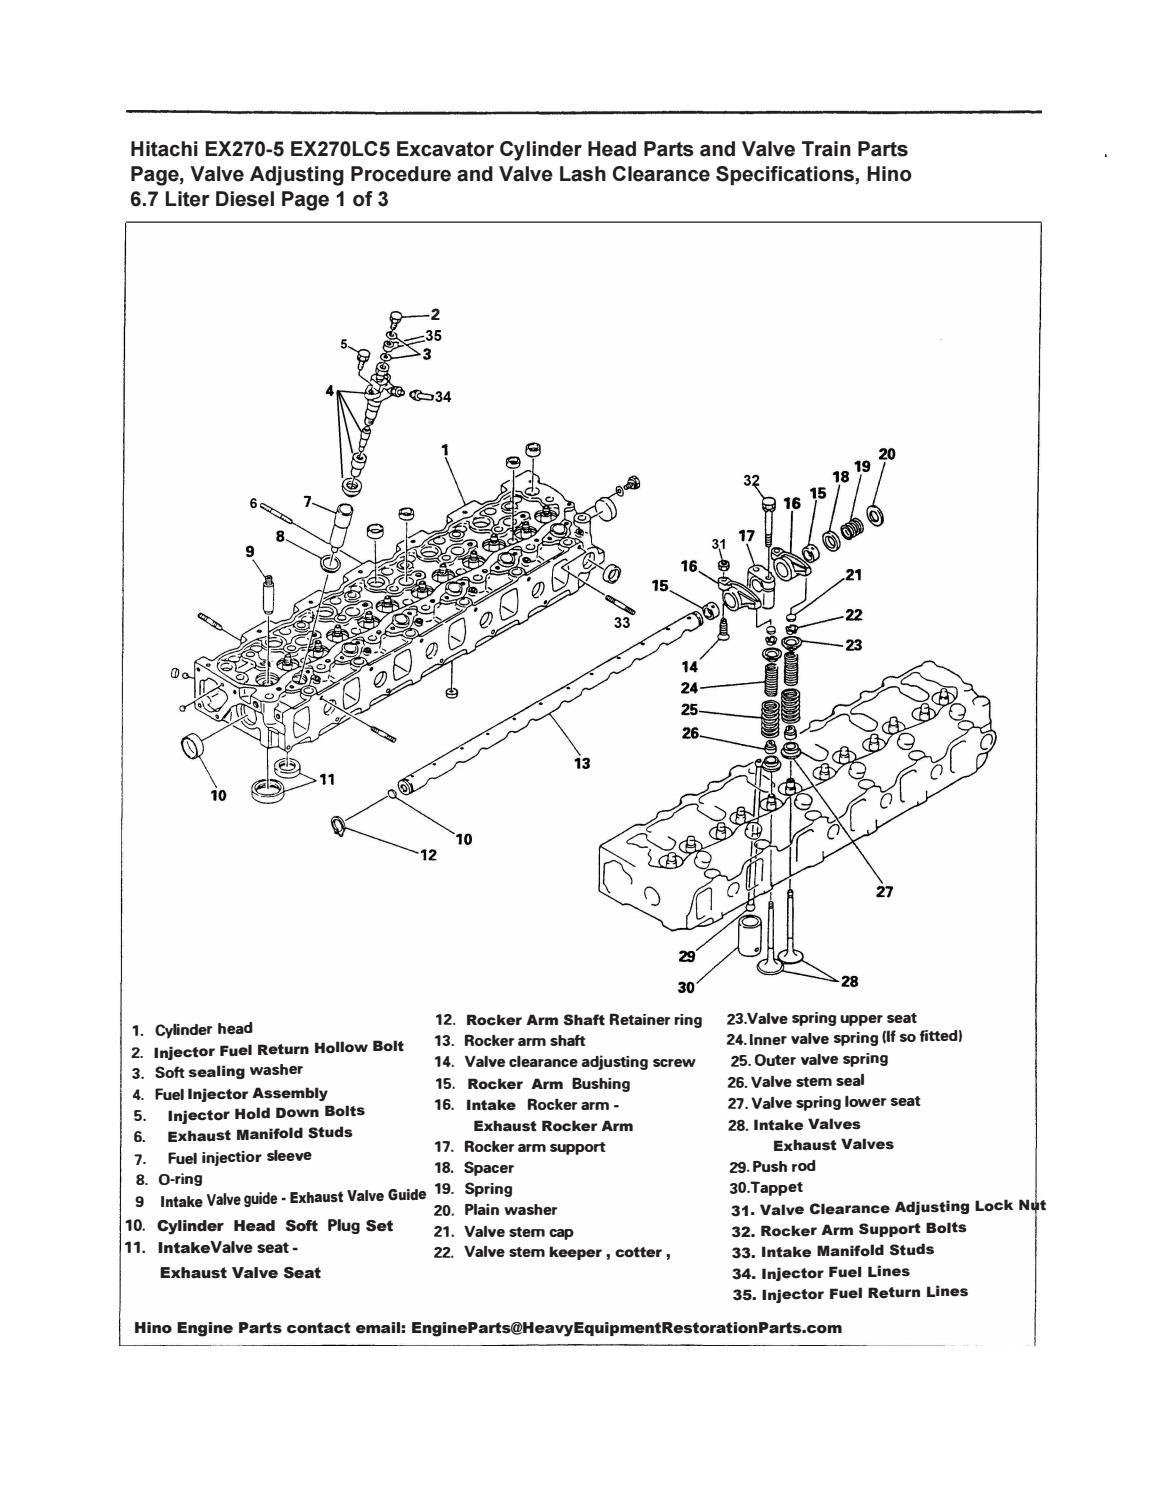 Hitachi EX270-5 EX270LC5 Excavator Cylinder Head Parts and